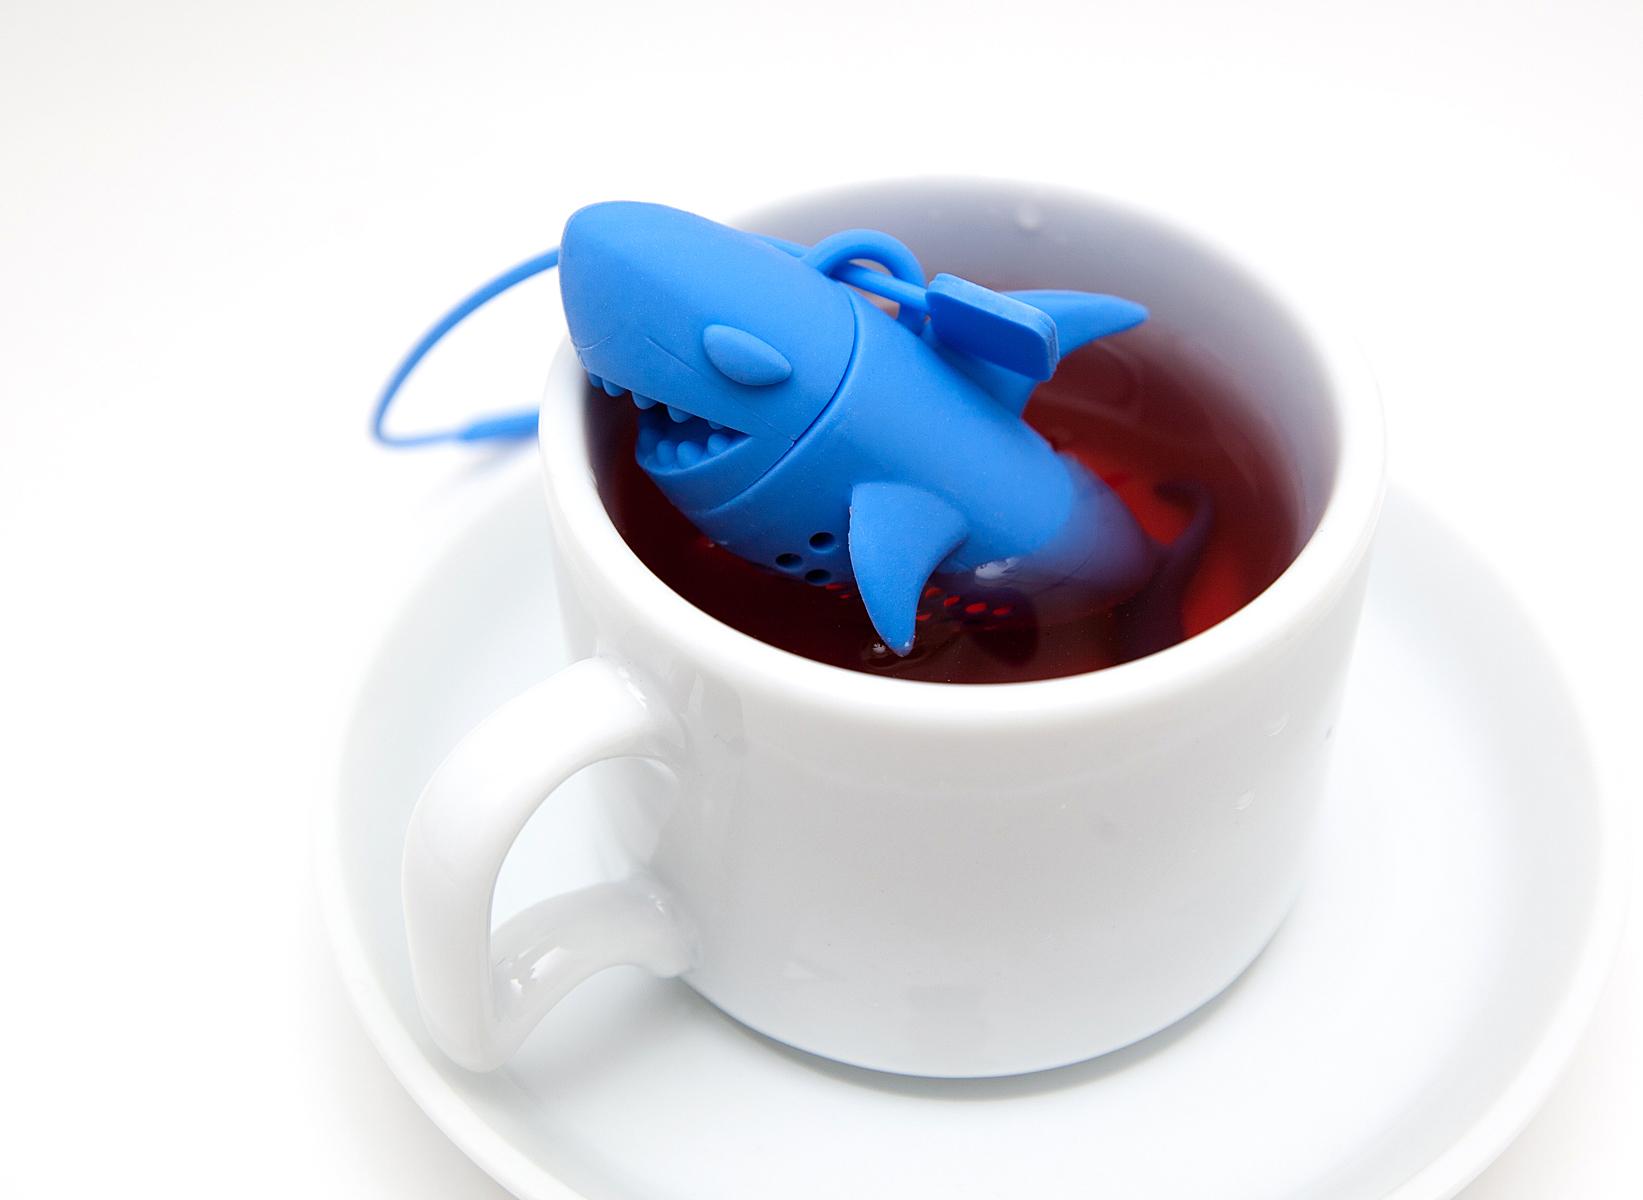 infuseur th requin les dents de la mer dans votre tasse de th super insolite. Black Bedroom Furniture Sets. Home Design Ideas